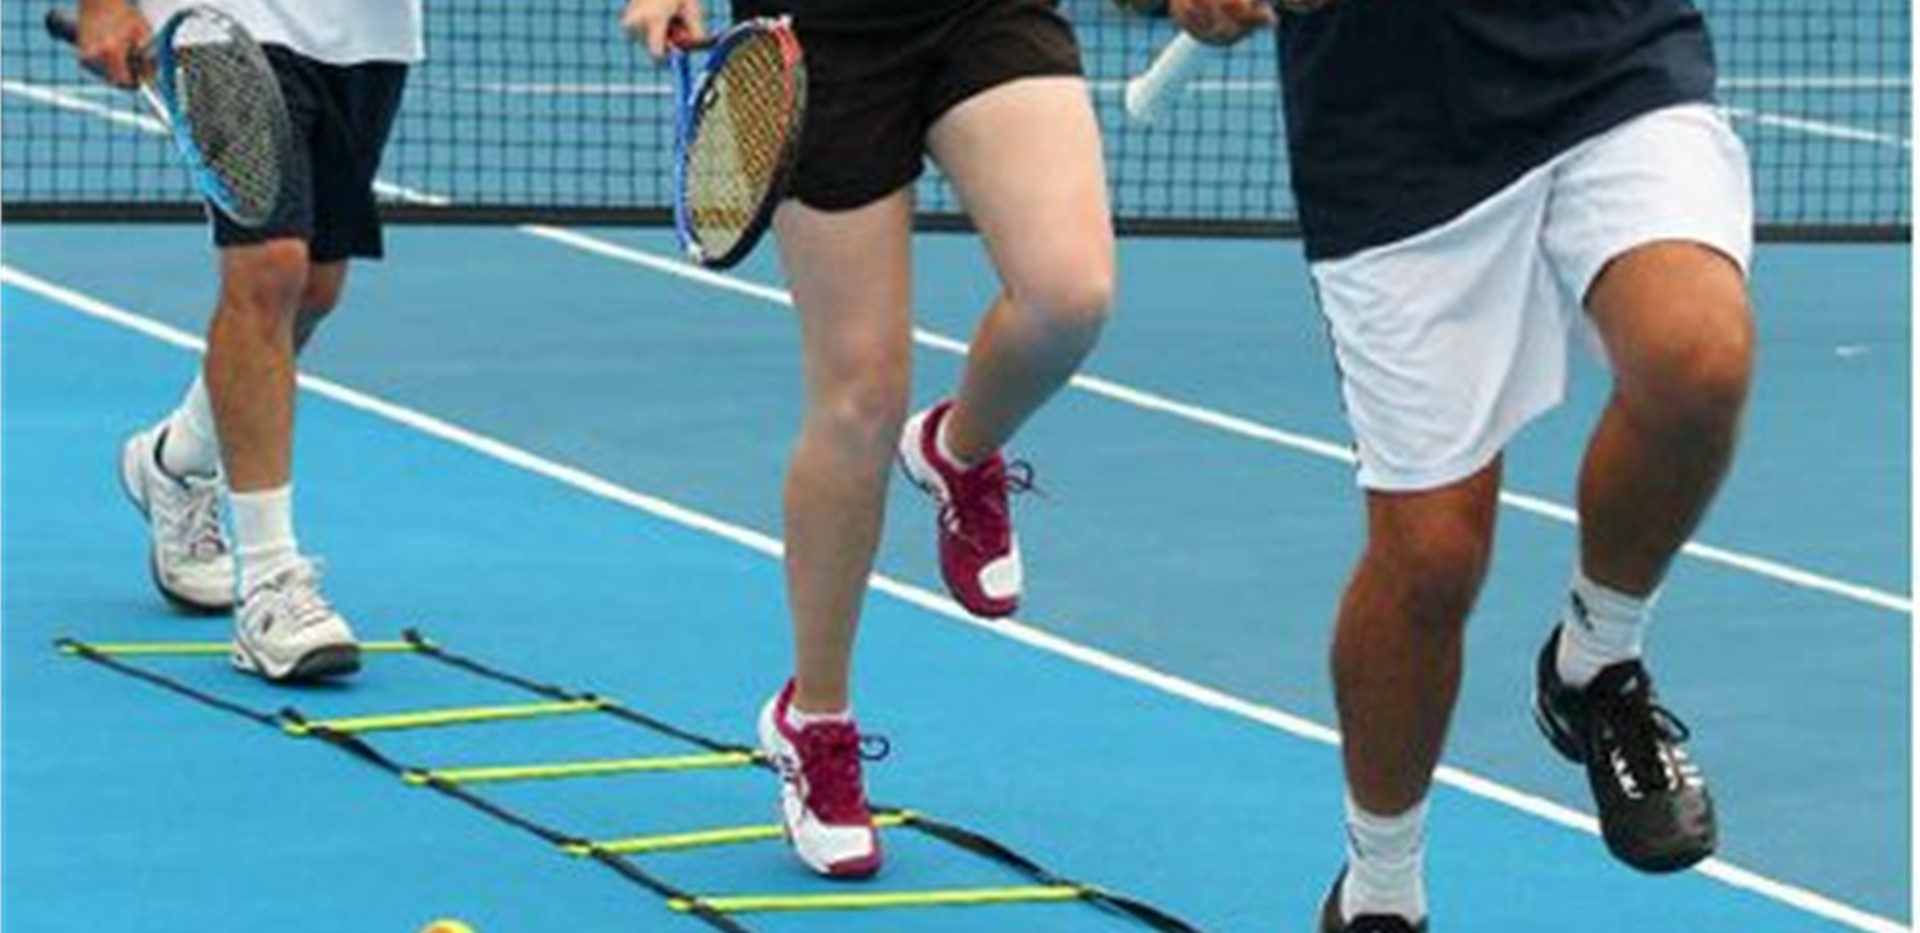 cardio-tennis.jpg